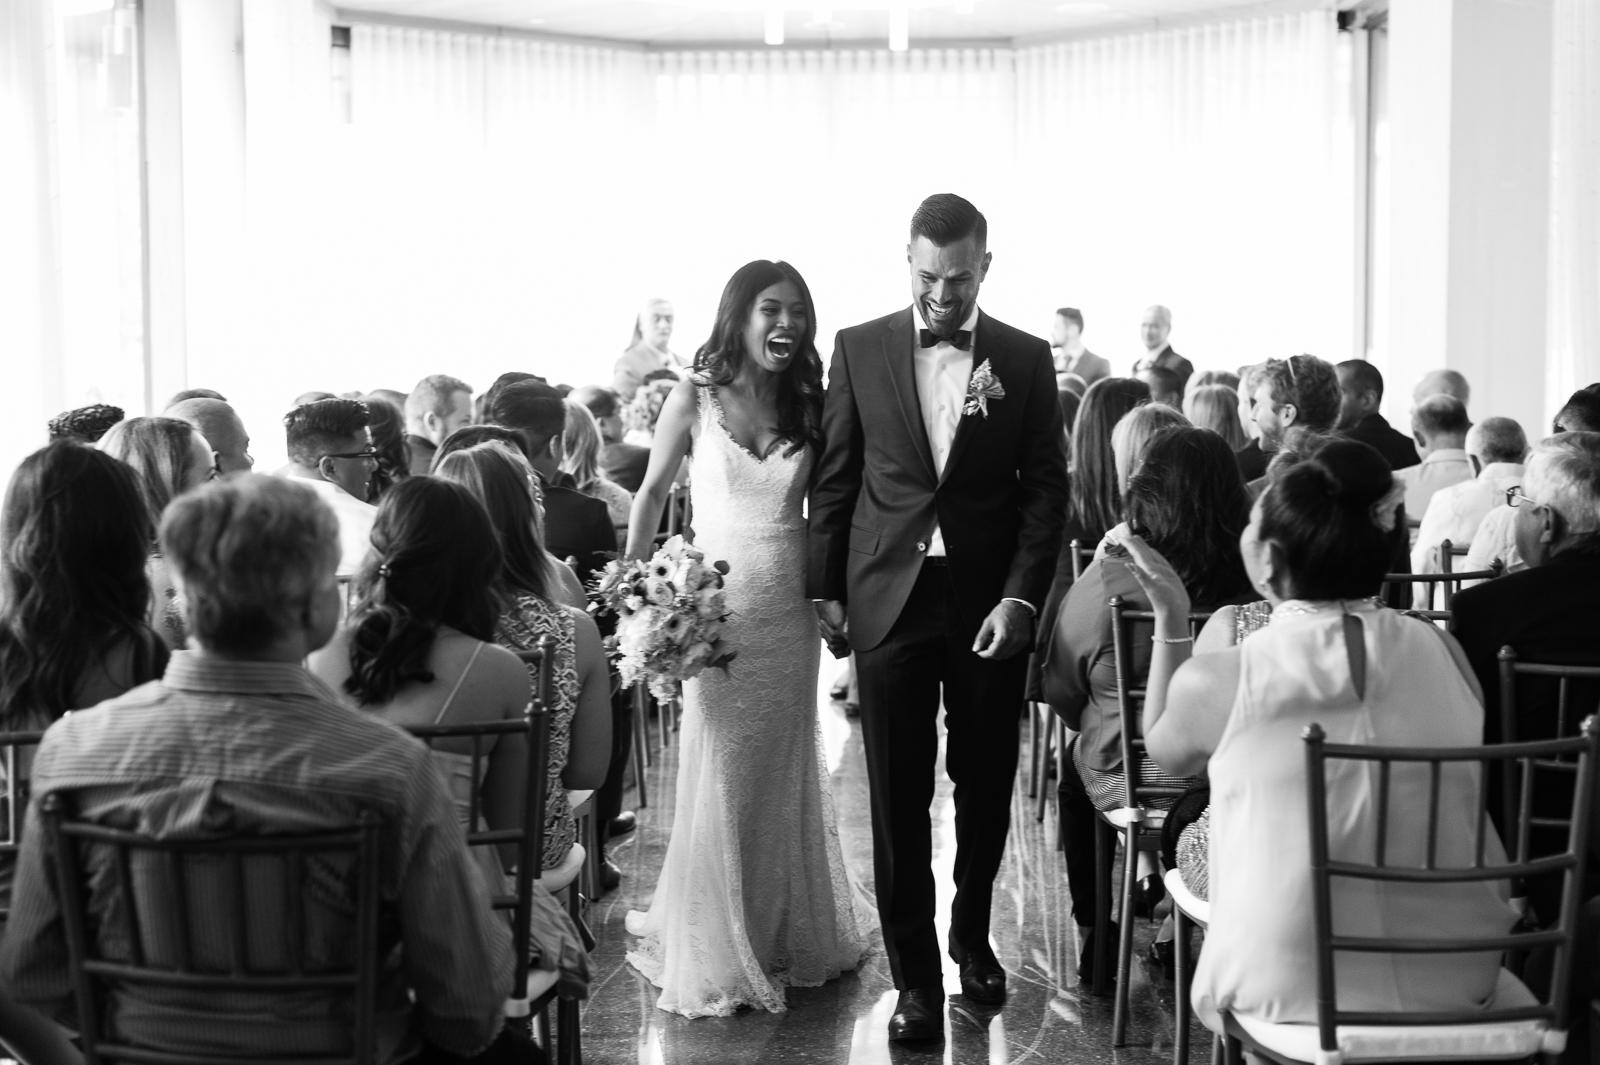 tara-mcmullen-photography-toronto-wedding-photography-alderlea-mansion-wedding-alderlea-wedding-brampton-scotsdale-farm-wedding-reem-acra-wedding-023